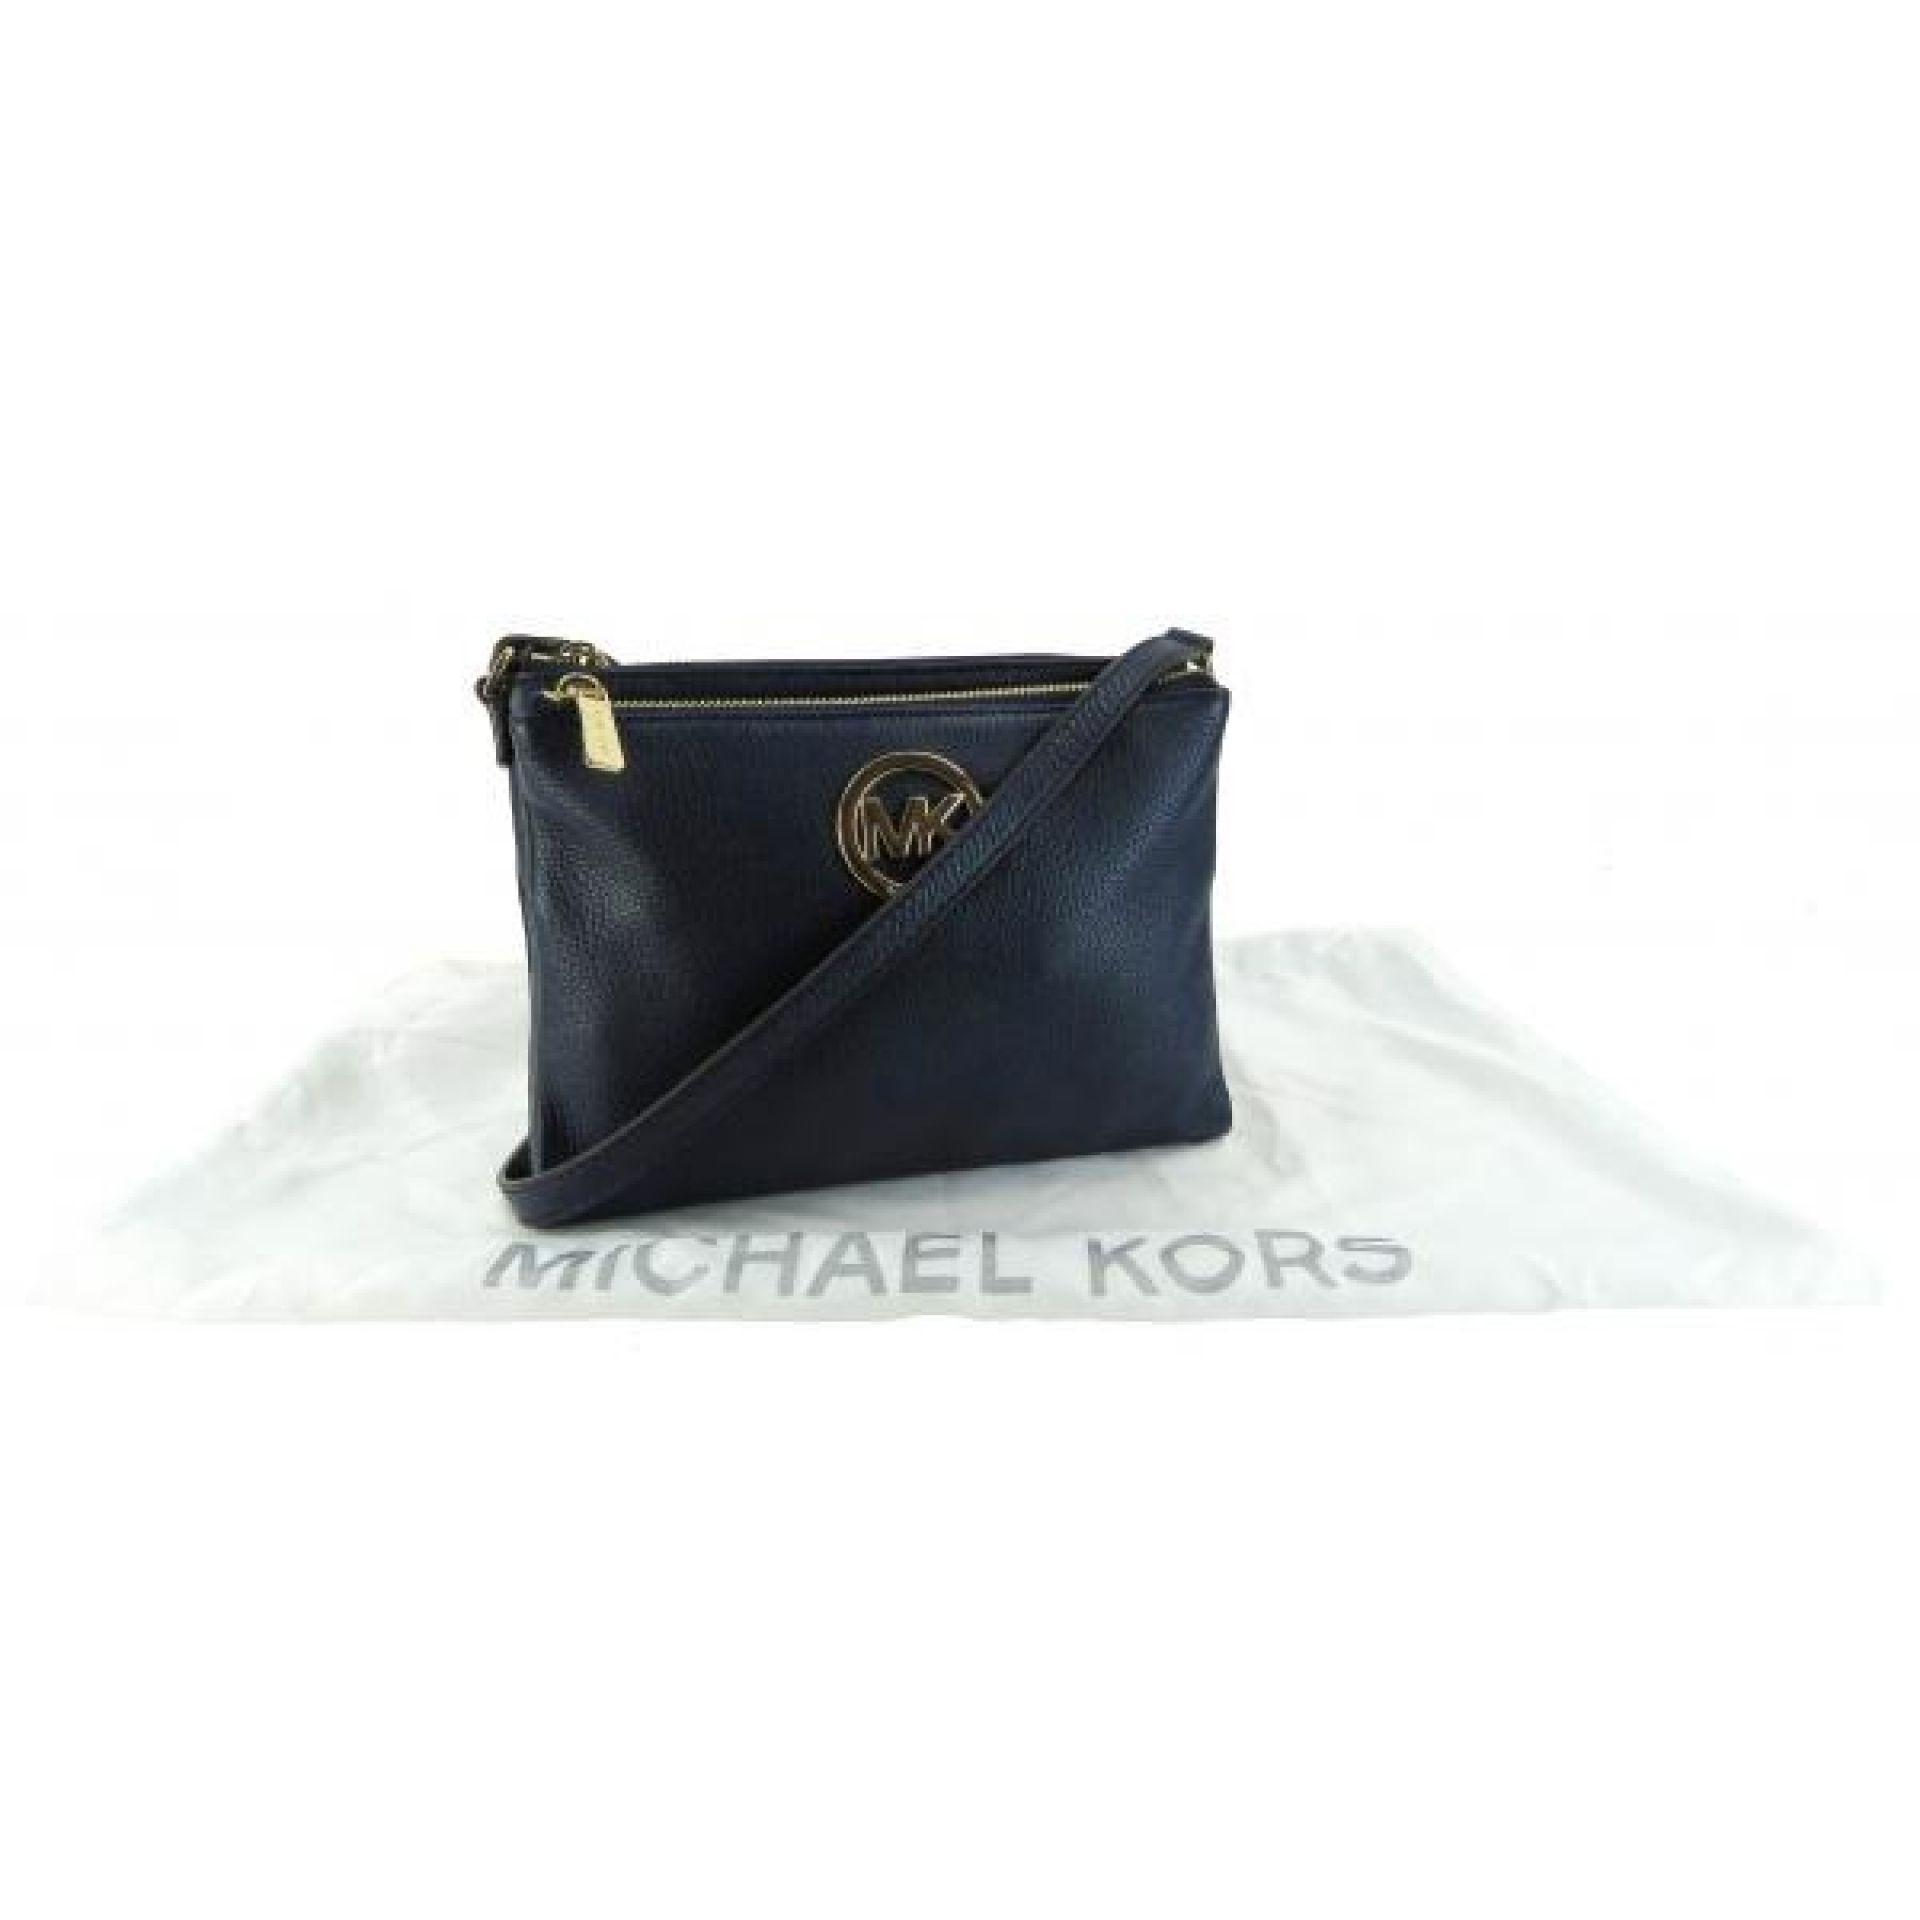 Michael Kors Navy Blue Pebbled Leather Adele Double Zip Crossbody Bag